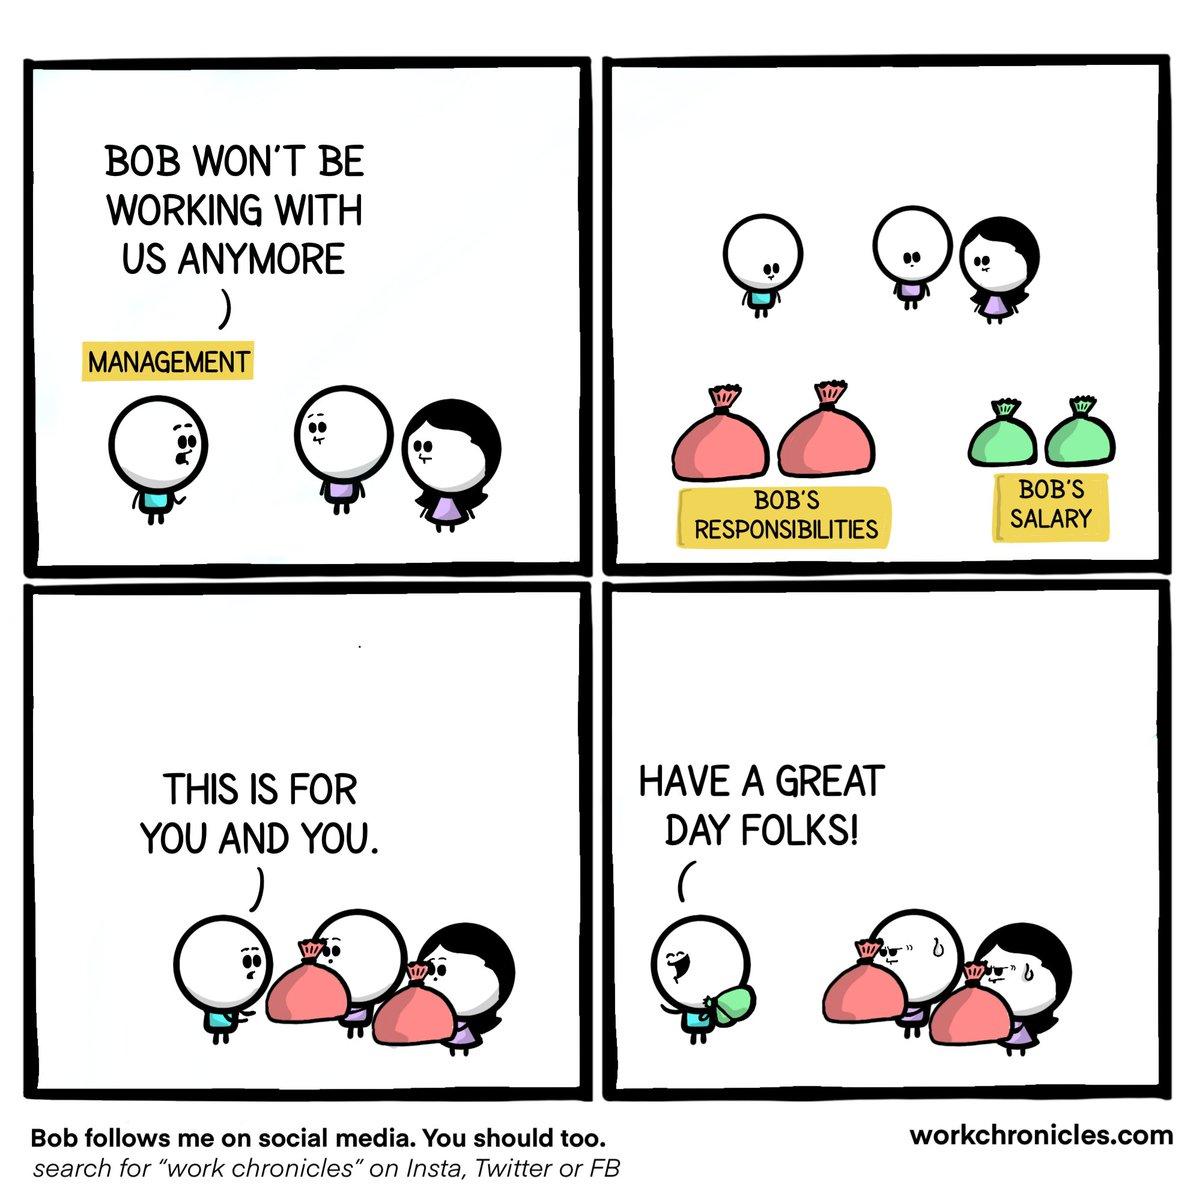 Responsibilities VS Salary  Not very #mondaymotivation. Credit to @_workchronicles.  #career #hr #comic #humor https://t.co/WKaAmpIuTY